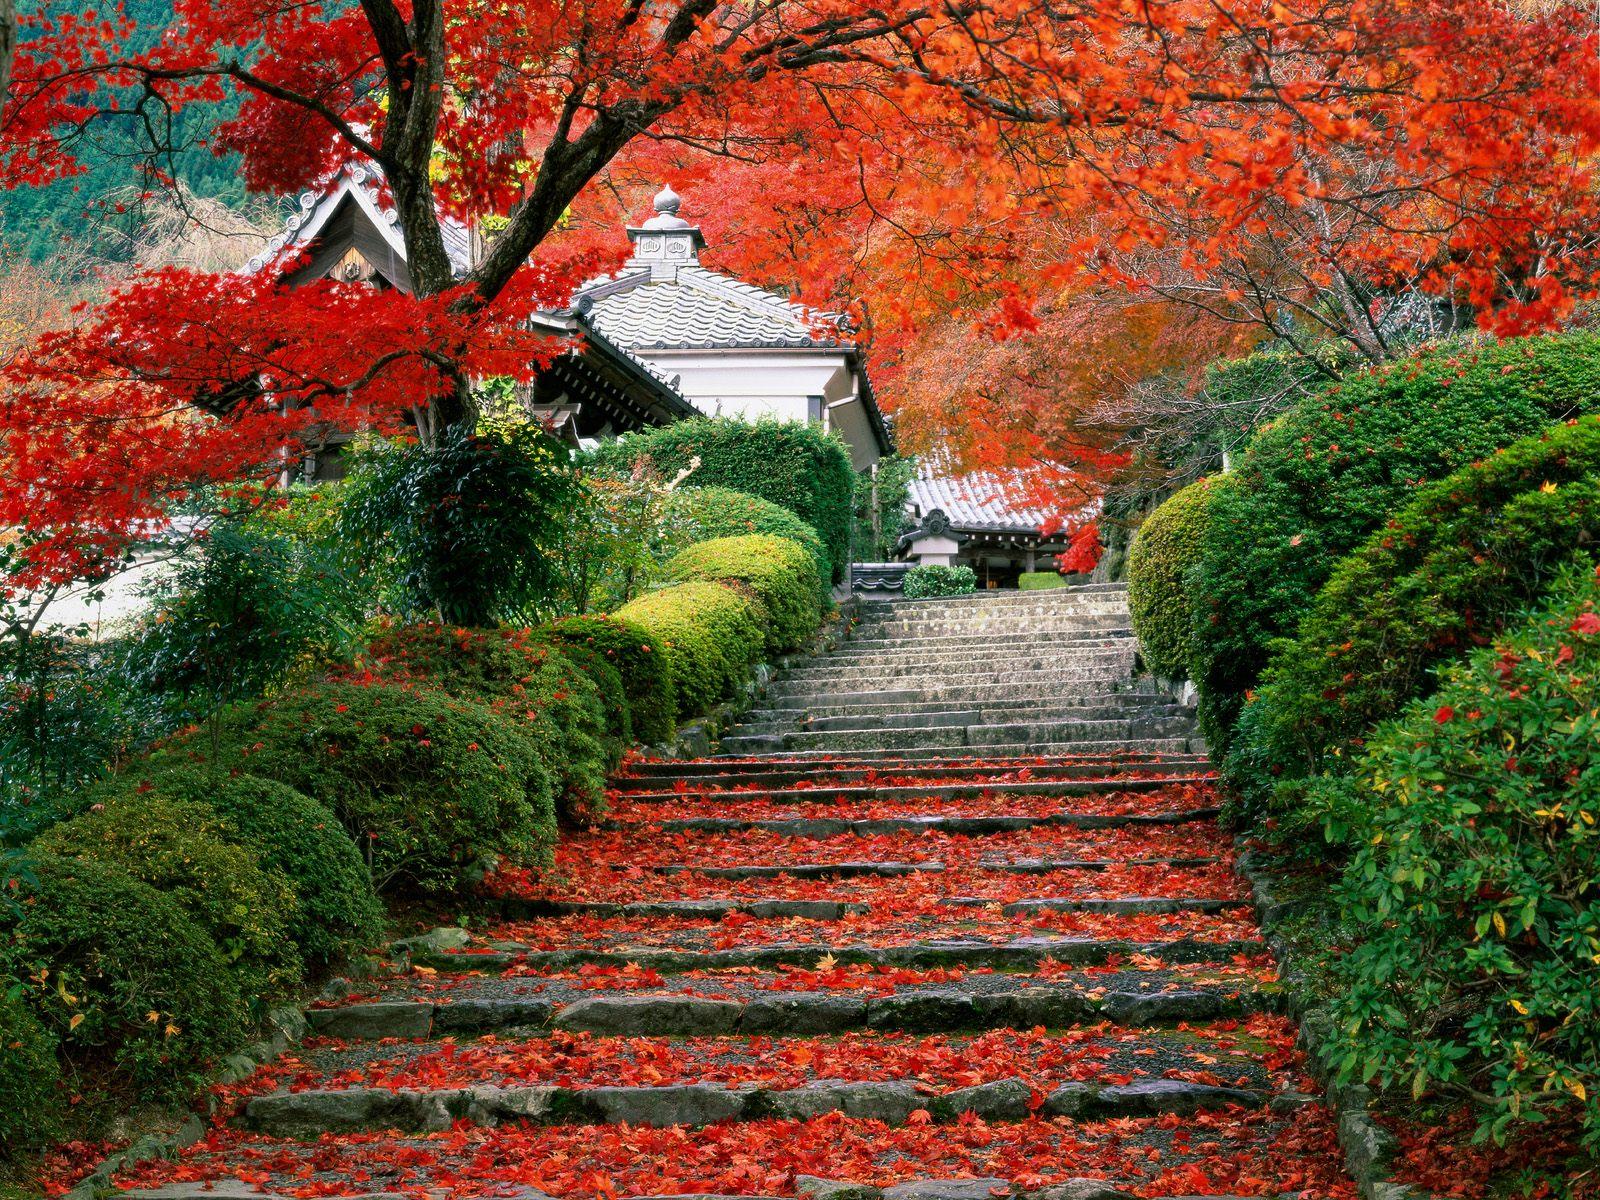 http://3.bp.blogspot.com/-2yw3VWRBAxg/Th3bmbxRxEI/AAAAAAAACNg/Z1ZuZgzd6g4/s1600/Garden+Staircase+Kyoto+Japan.jpg